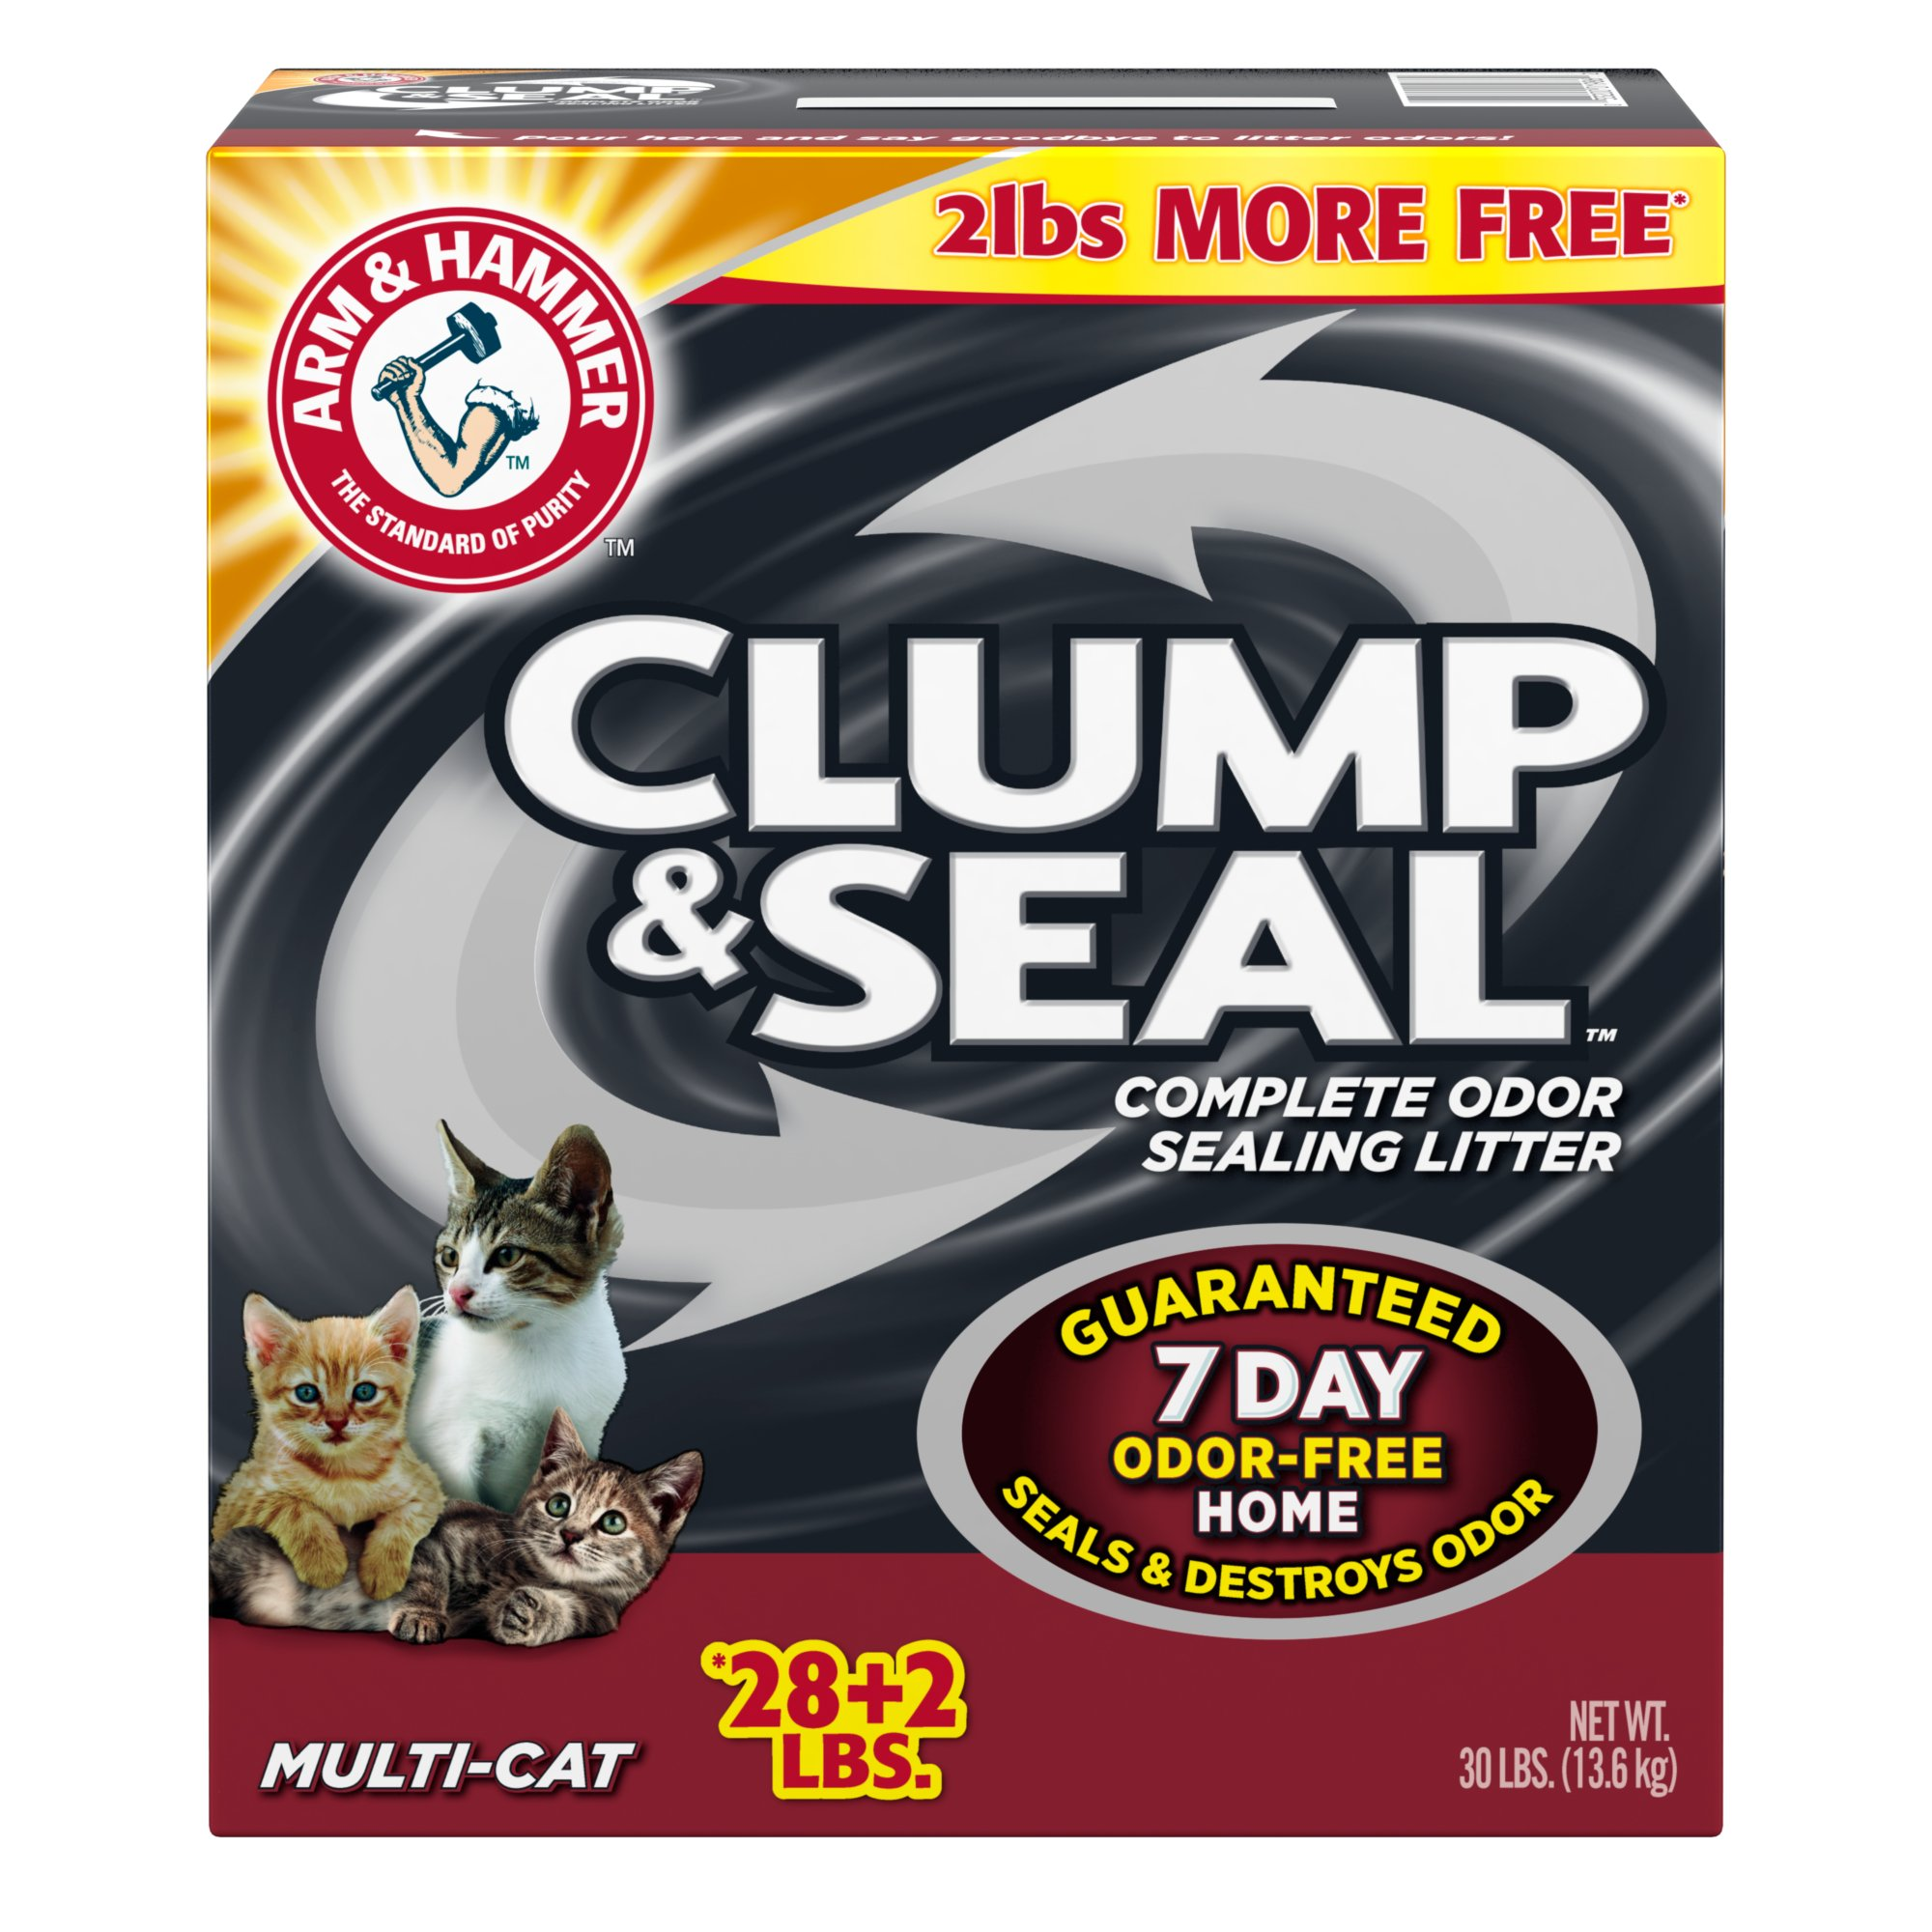 Arm & Hammer Clump & Seal Multi-Cat Odor Sealing Cat Litter